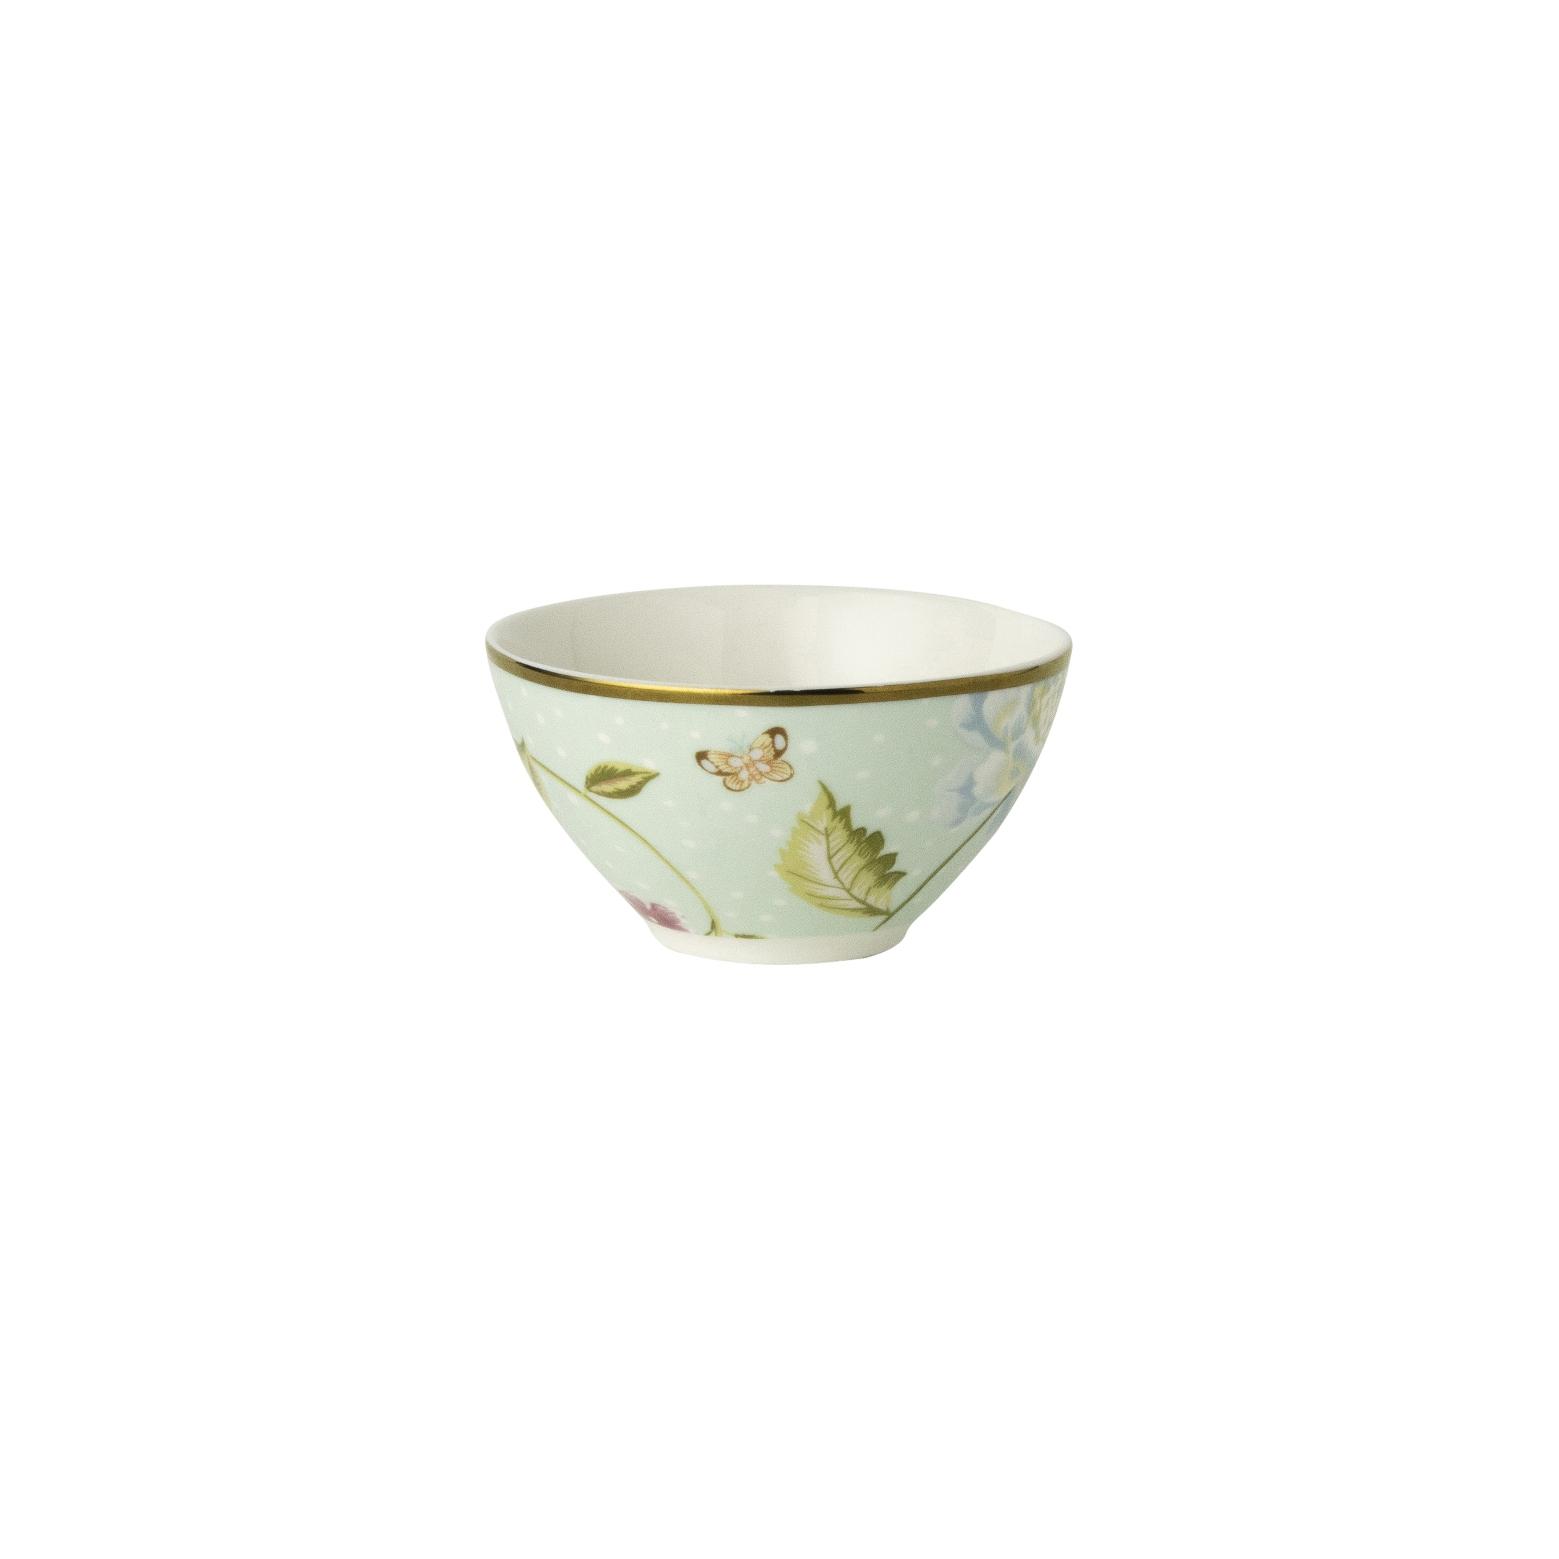 "Онлайн каталог PROMENU: Пиала ""Цветы"" Laura Ashley HERITAGE, диаметр 9 см, мятный с цветком                               180465"